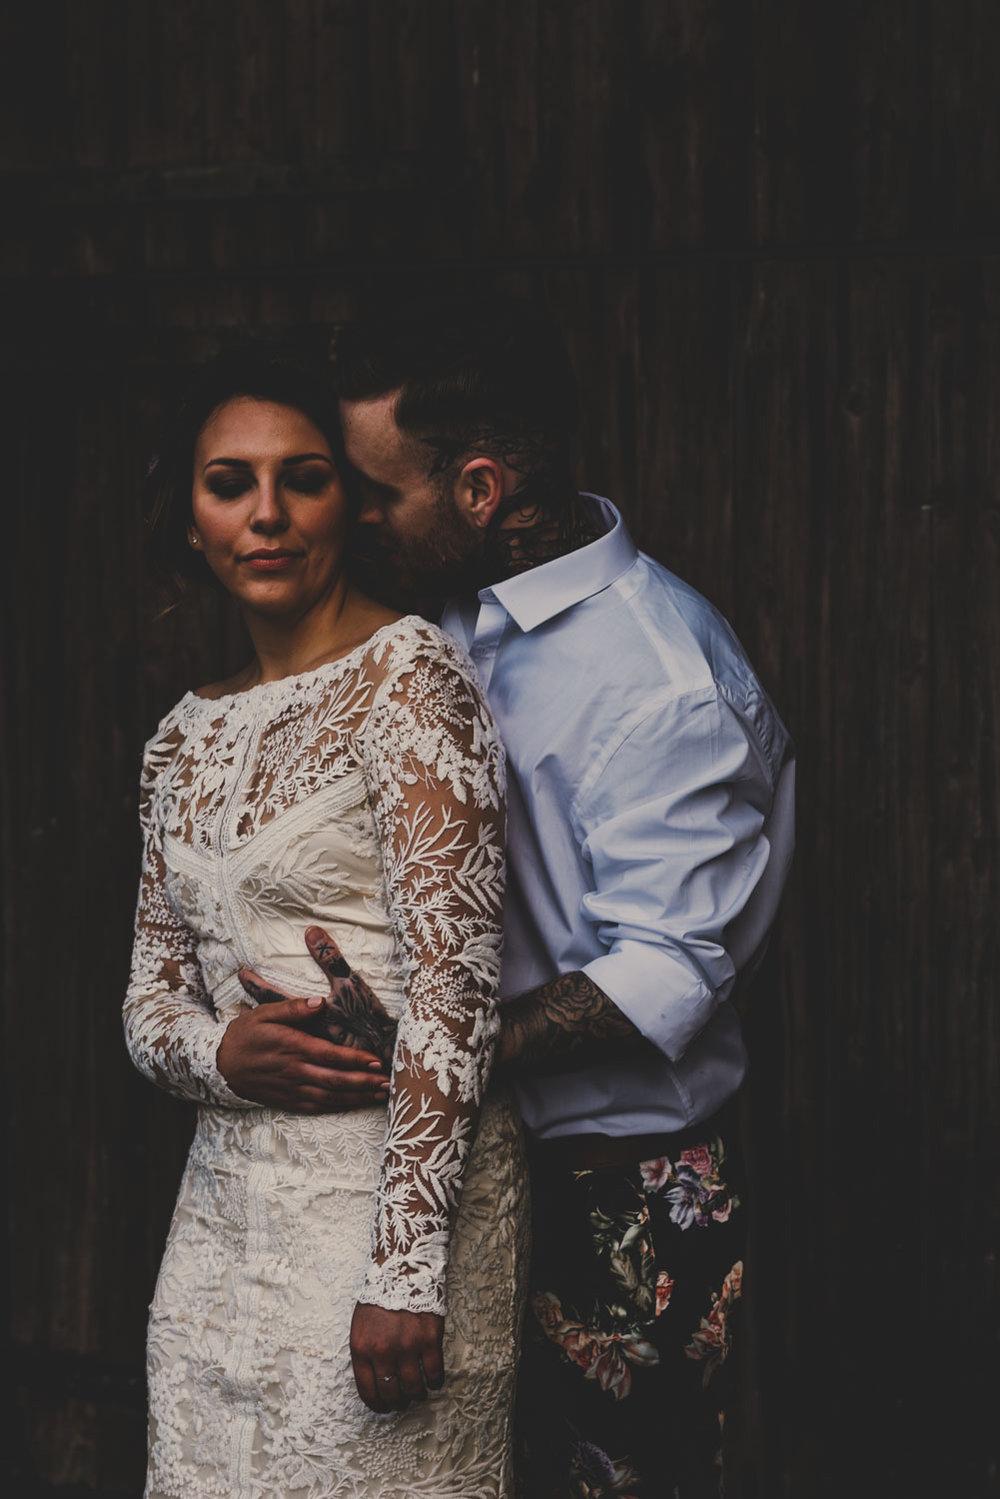 east-riddlesden-hall-wedding-jade-maguire-photography (38).jpg